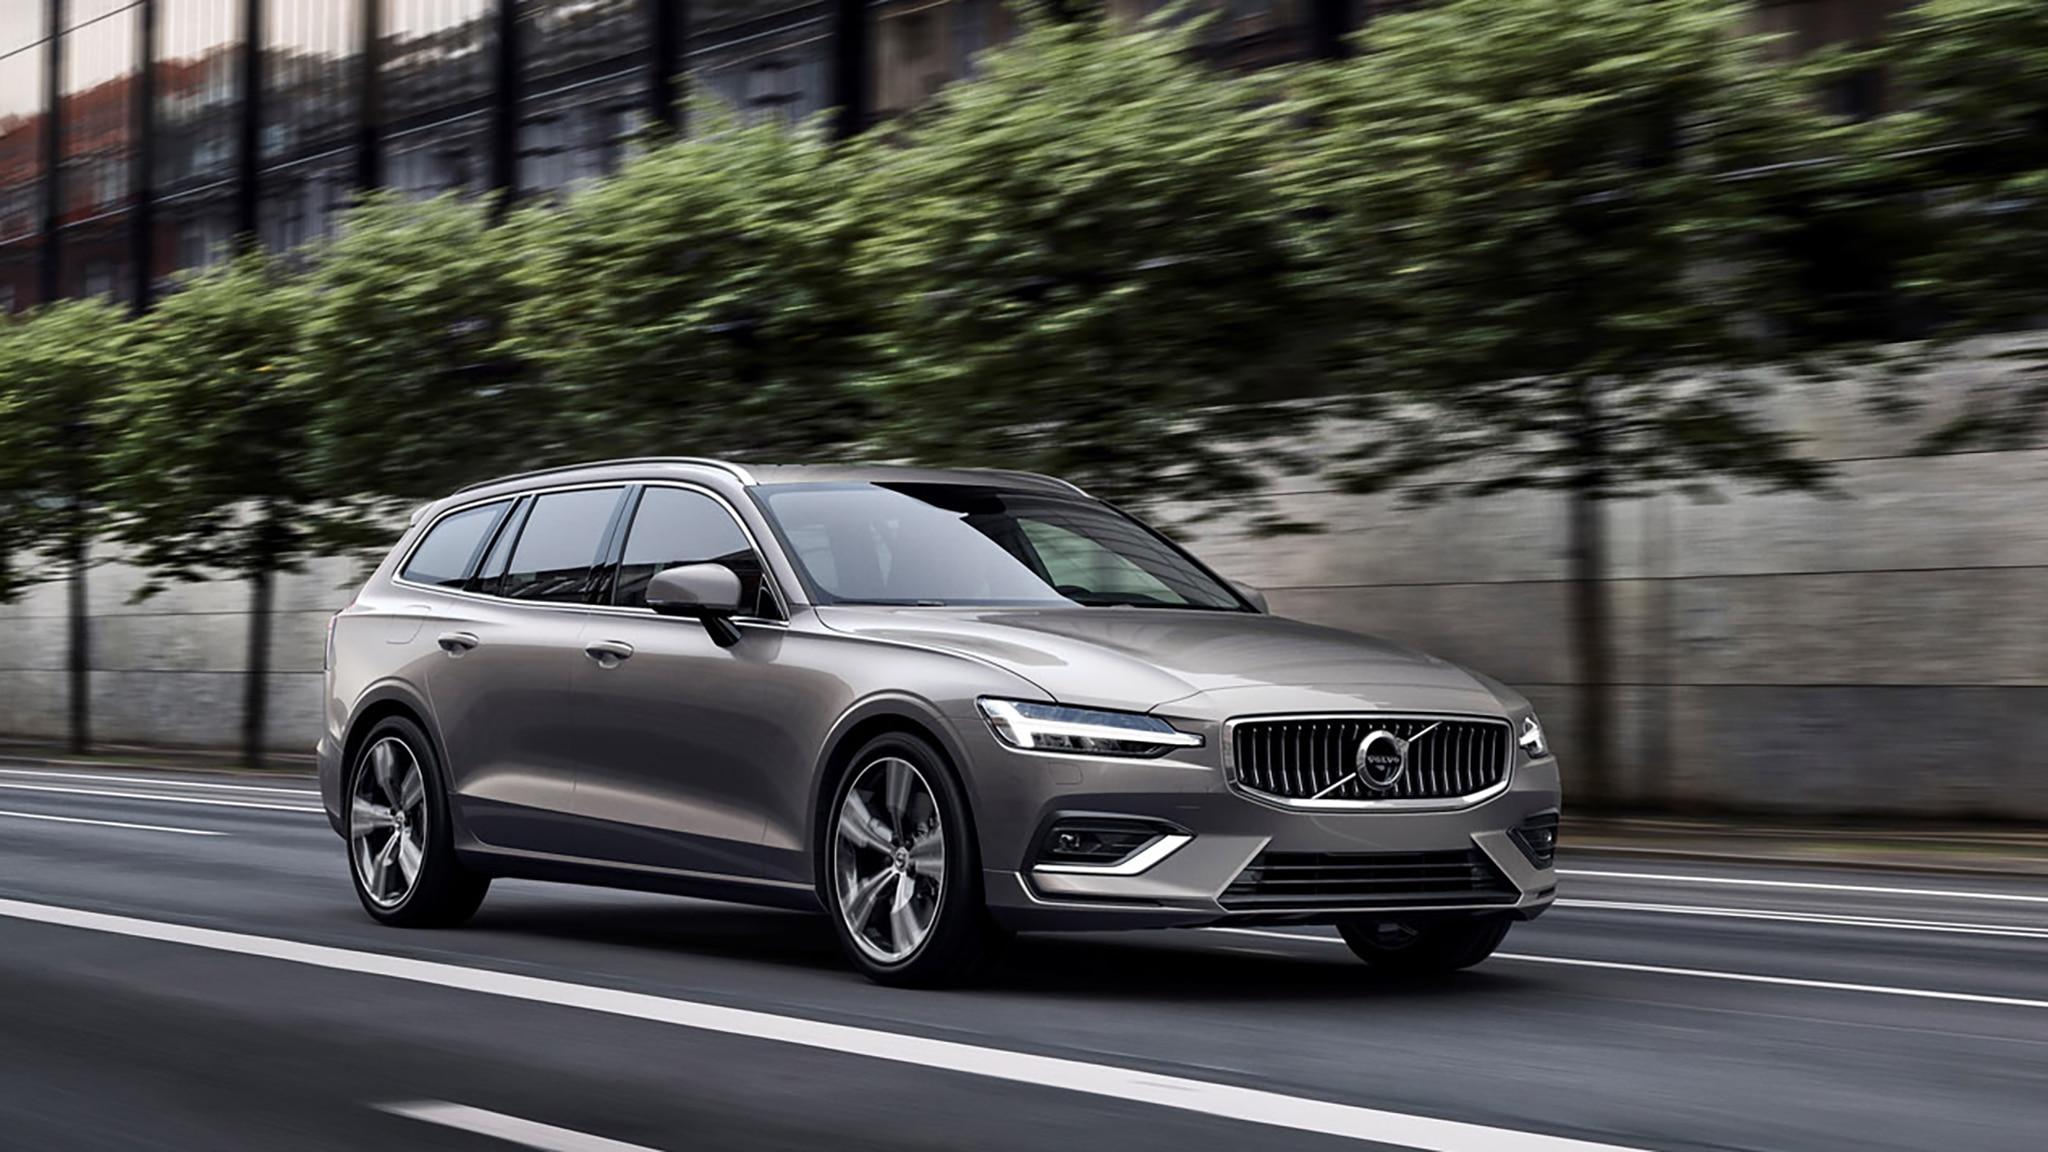 2019_Volvo_V60_exterior